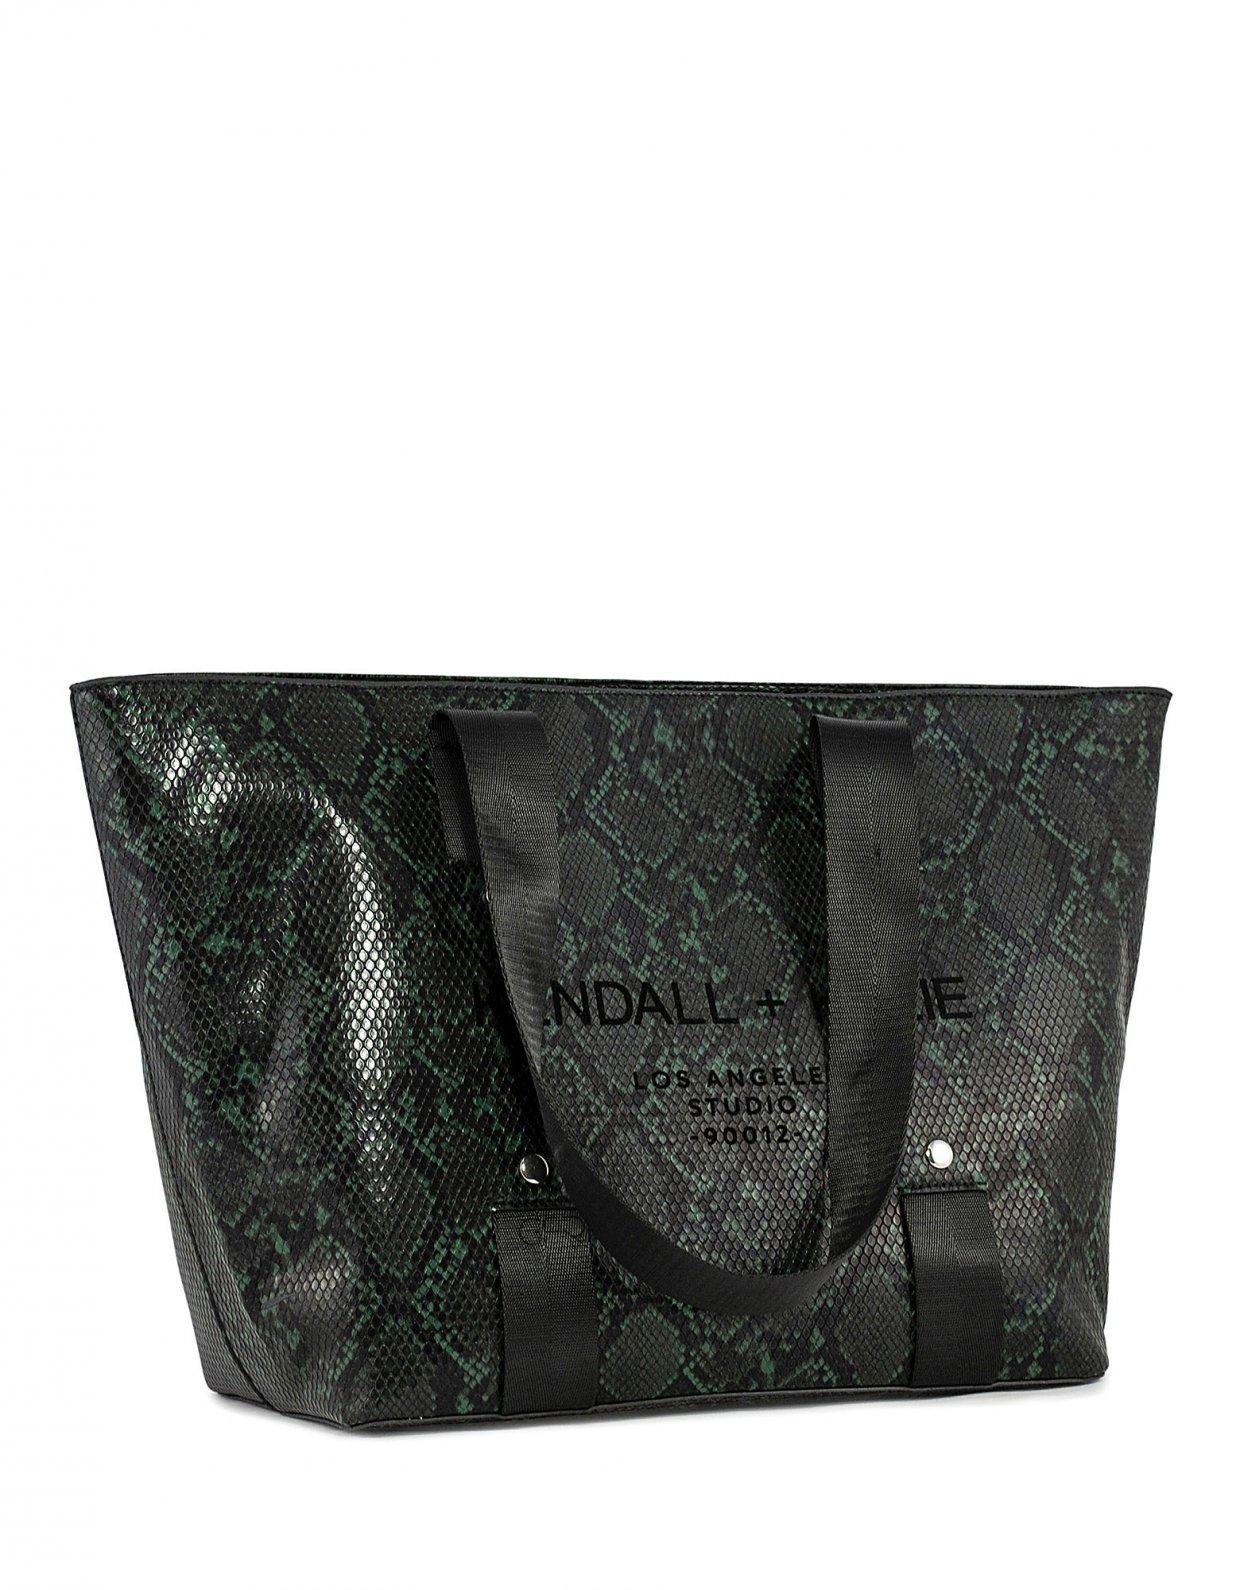 Kendall + Kylie Valerie tote bag green snake